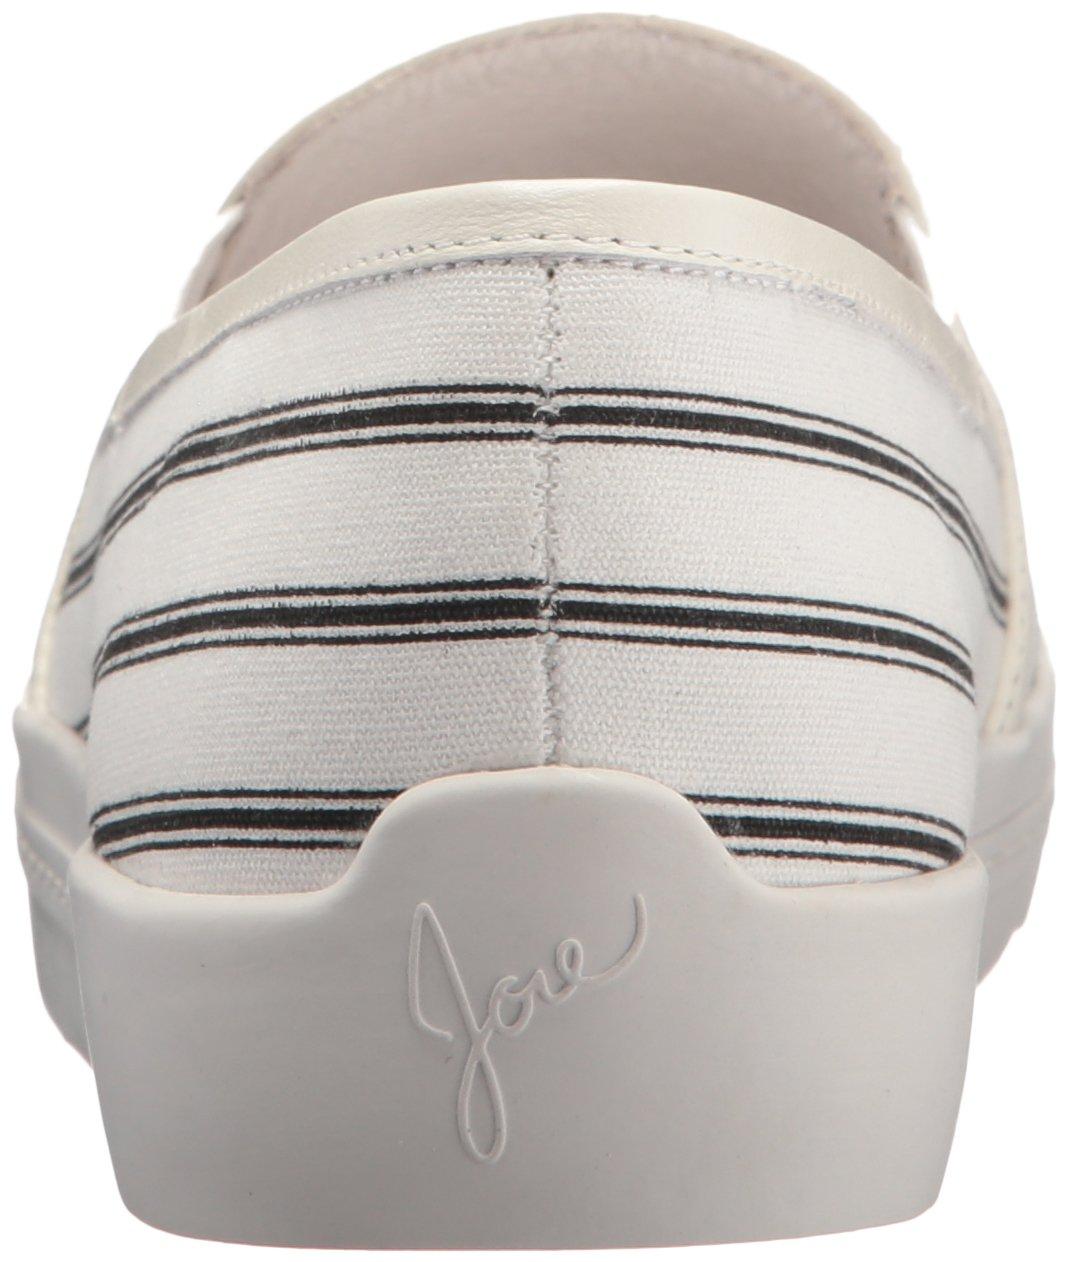 Joie Women's Huxley Skate Shoe B0792MFJ59 41 Regular EU (11 US)|Caviar-porcelain